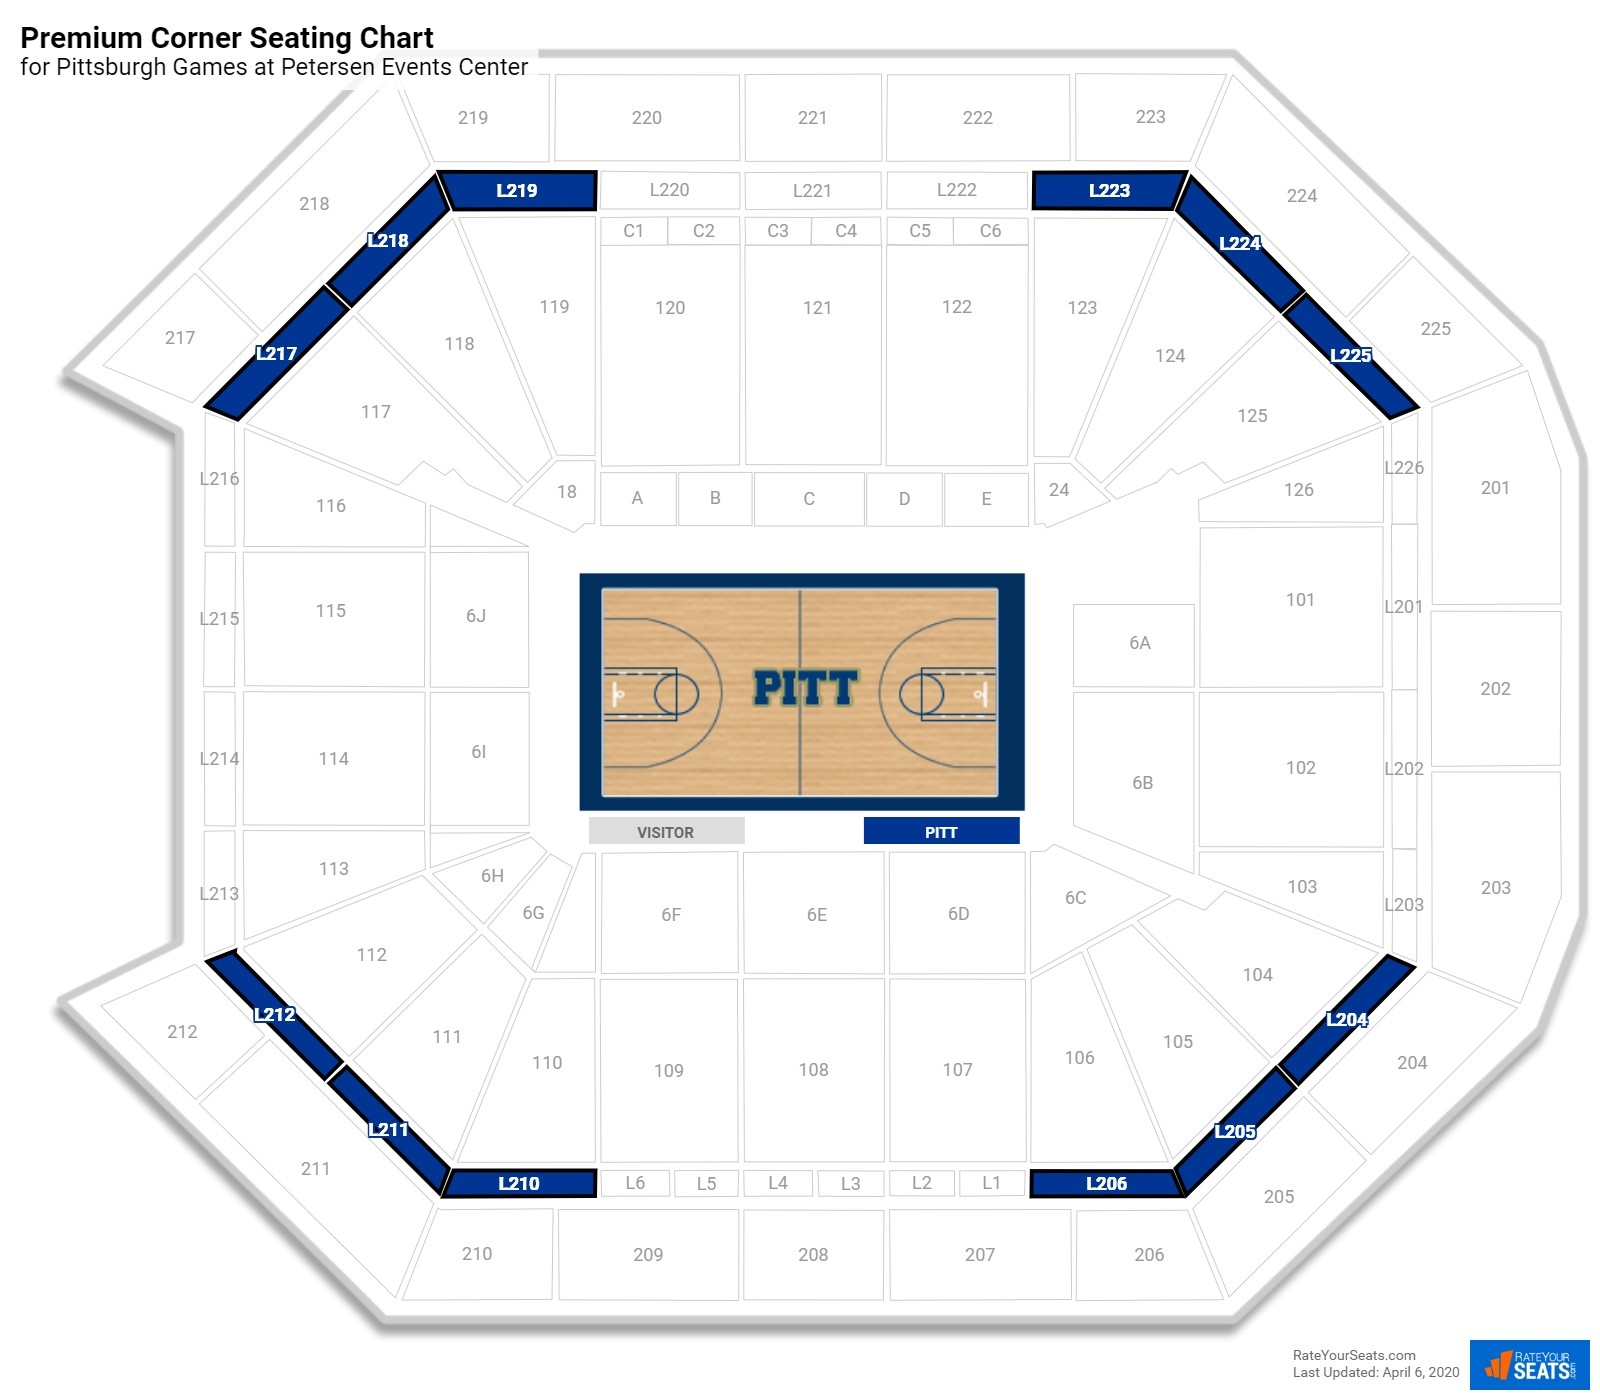 hight resolution of petersen events center premium corner seating chart